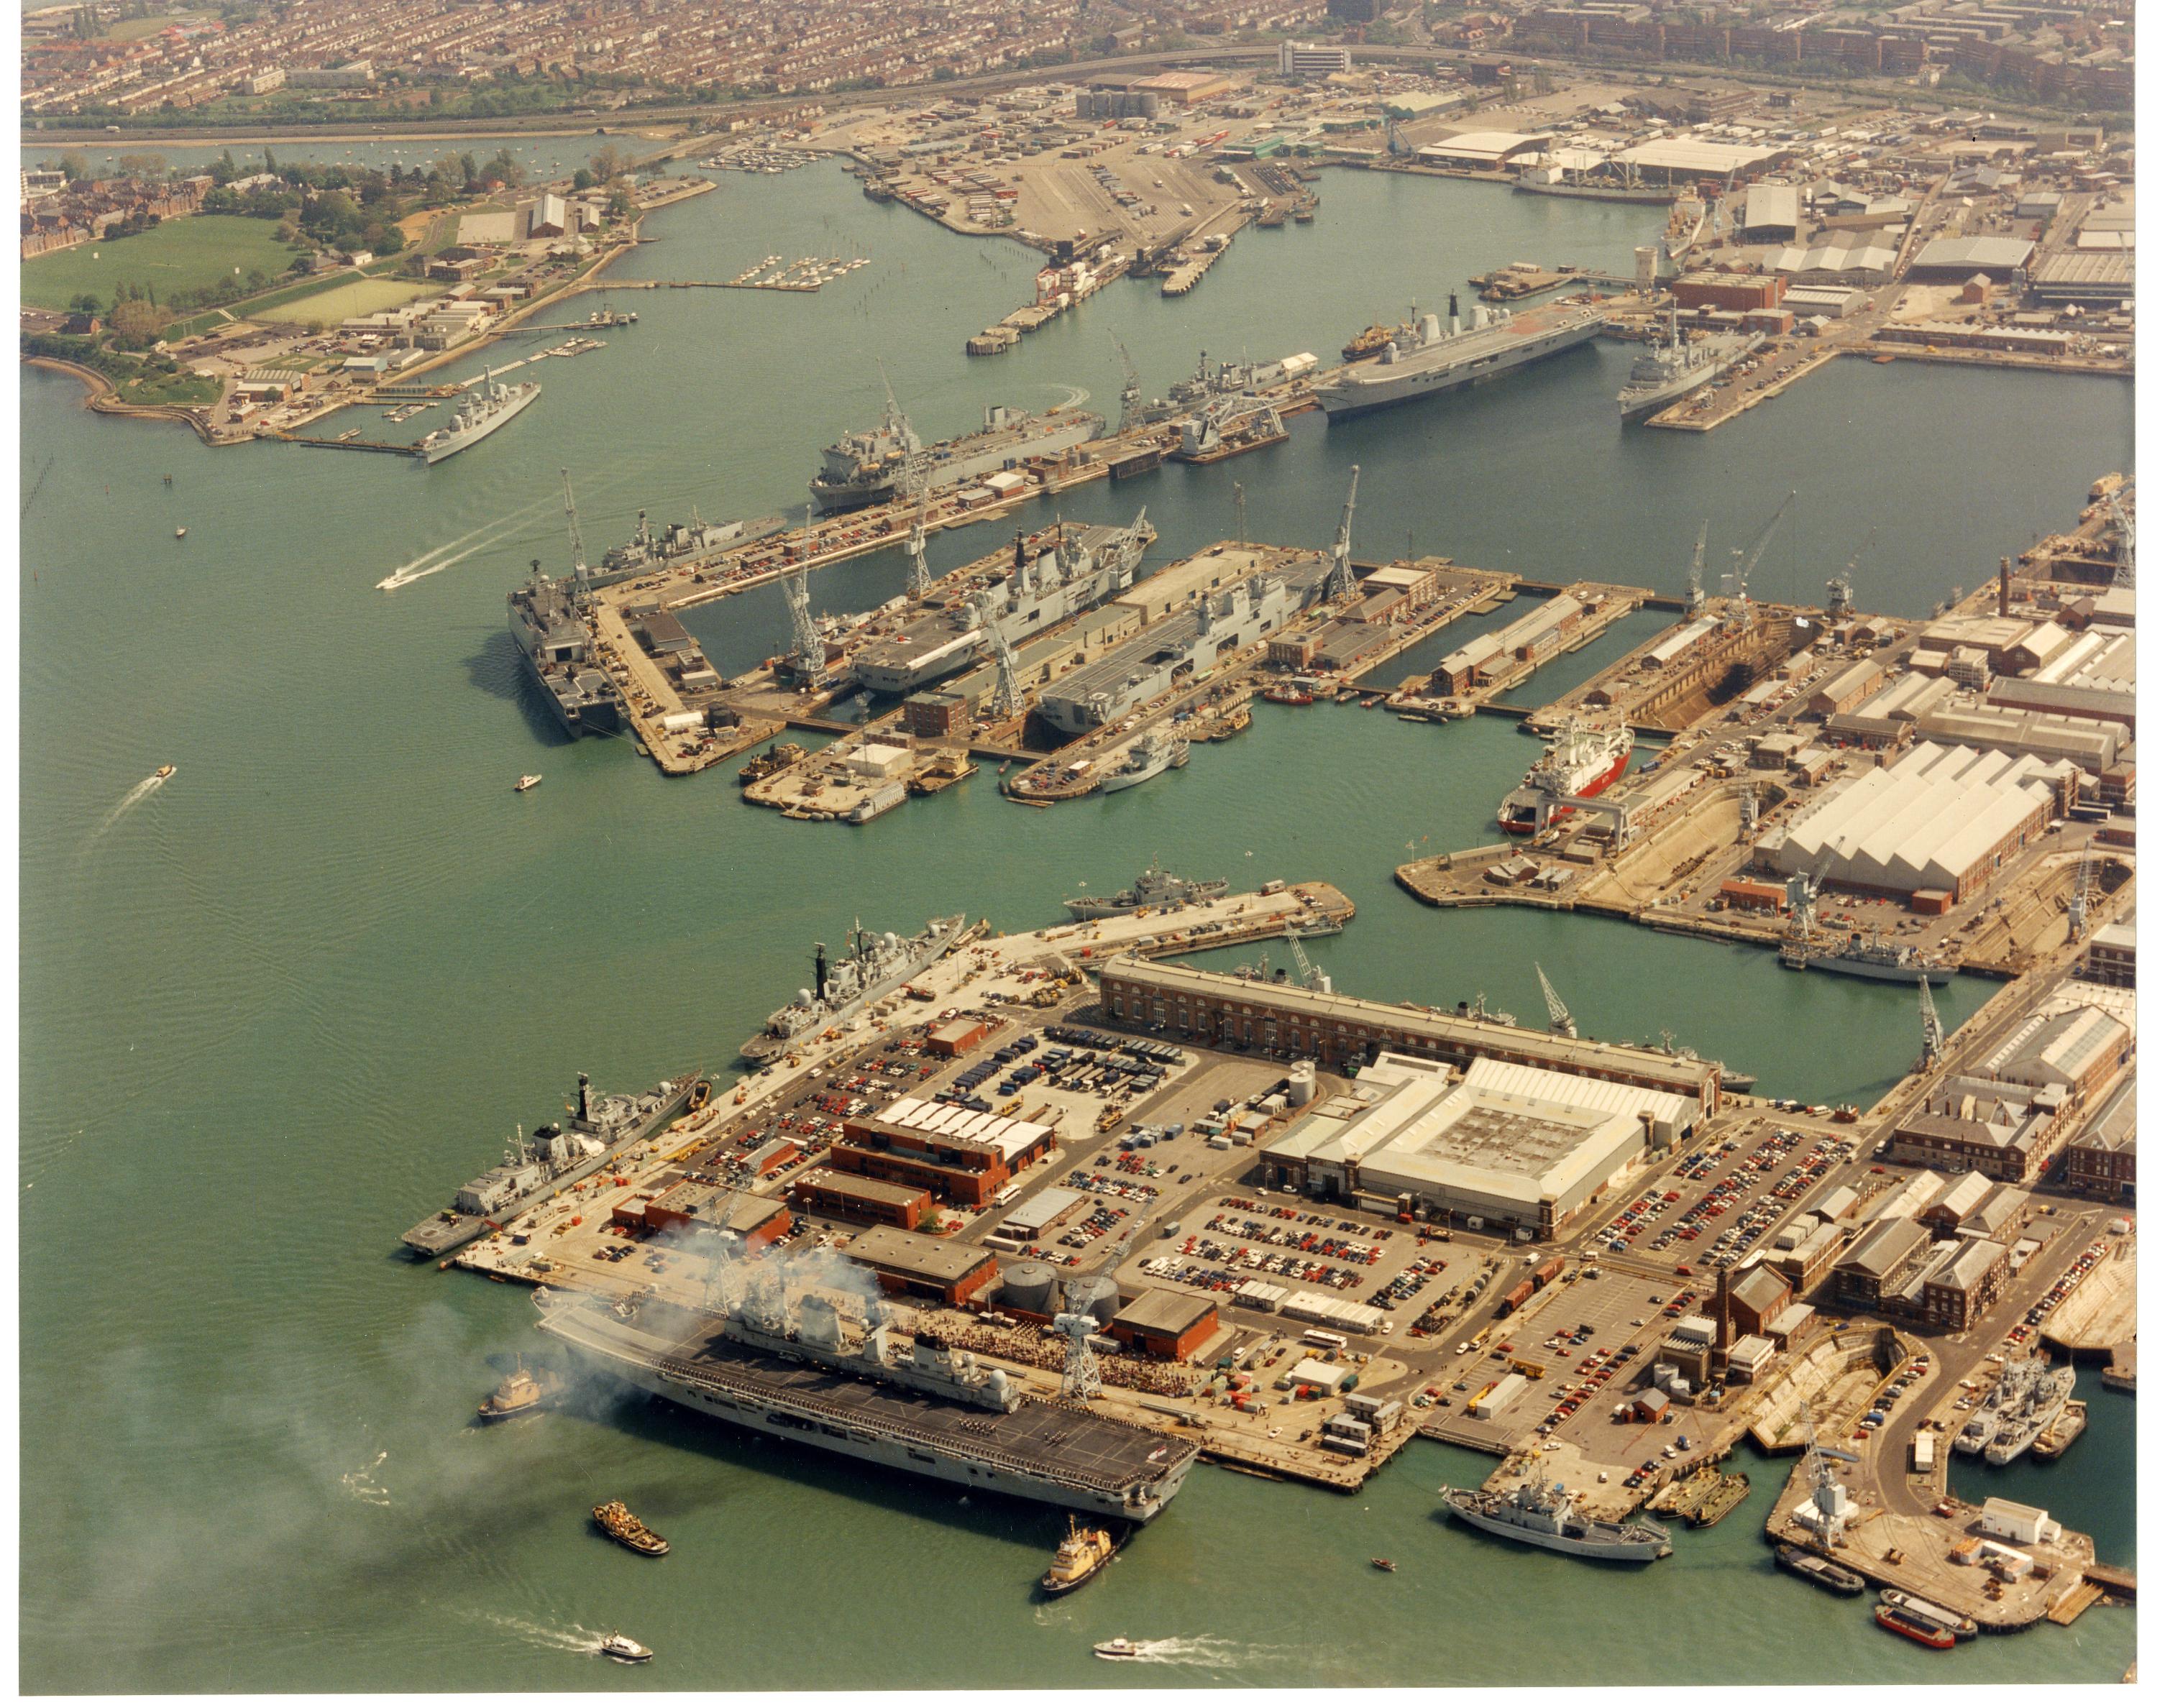 98-Full Dockyard